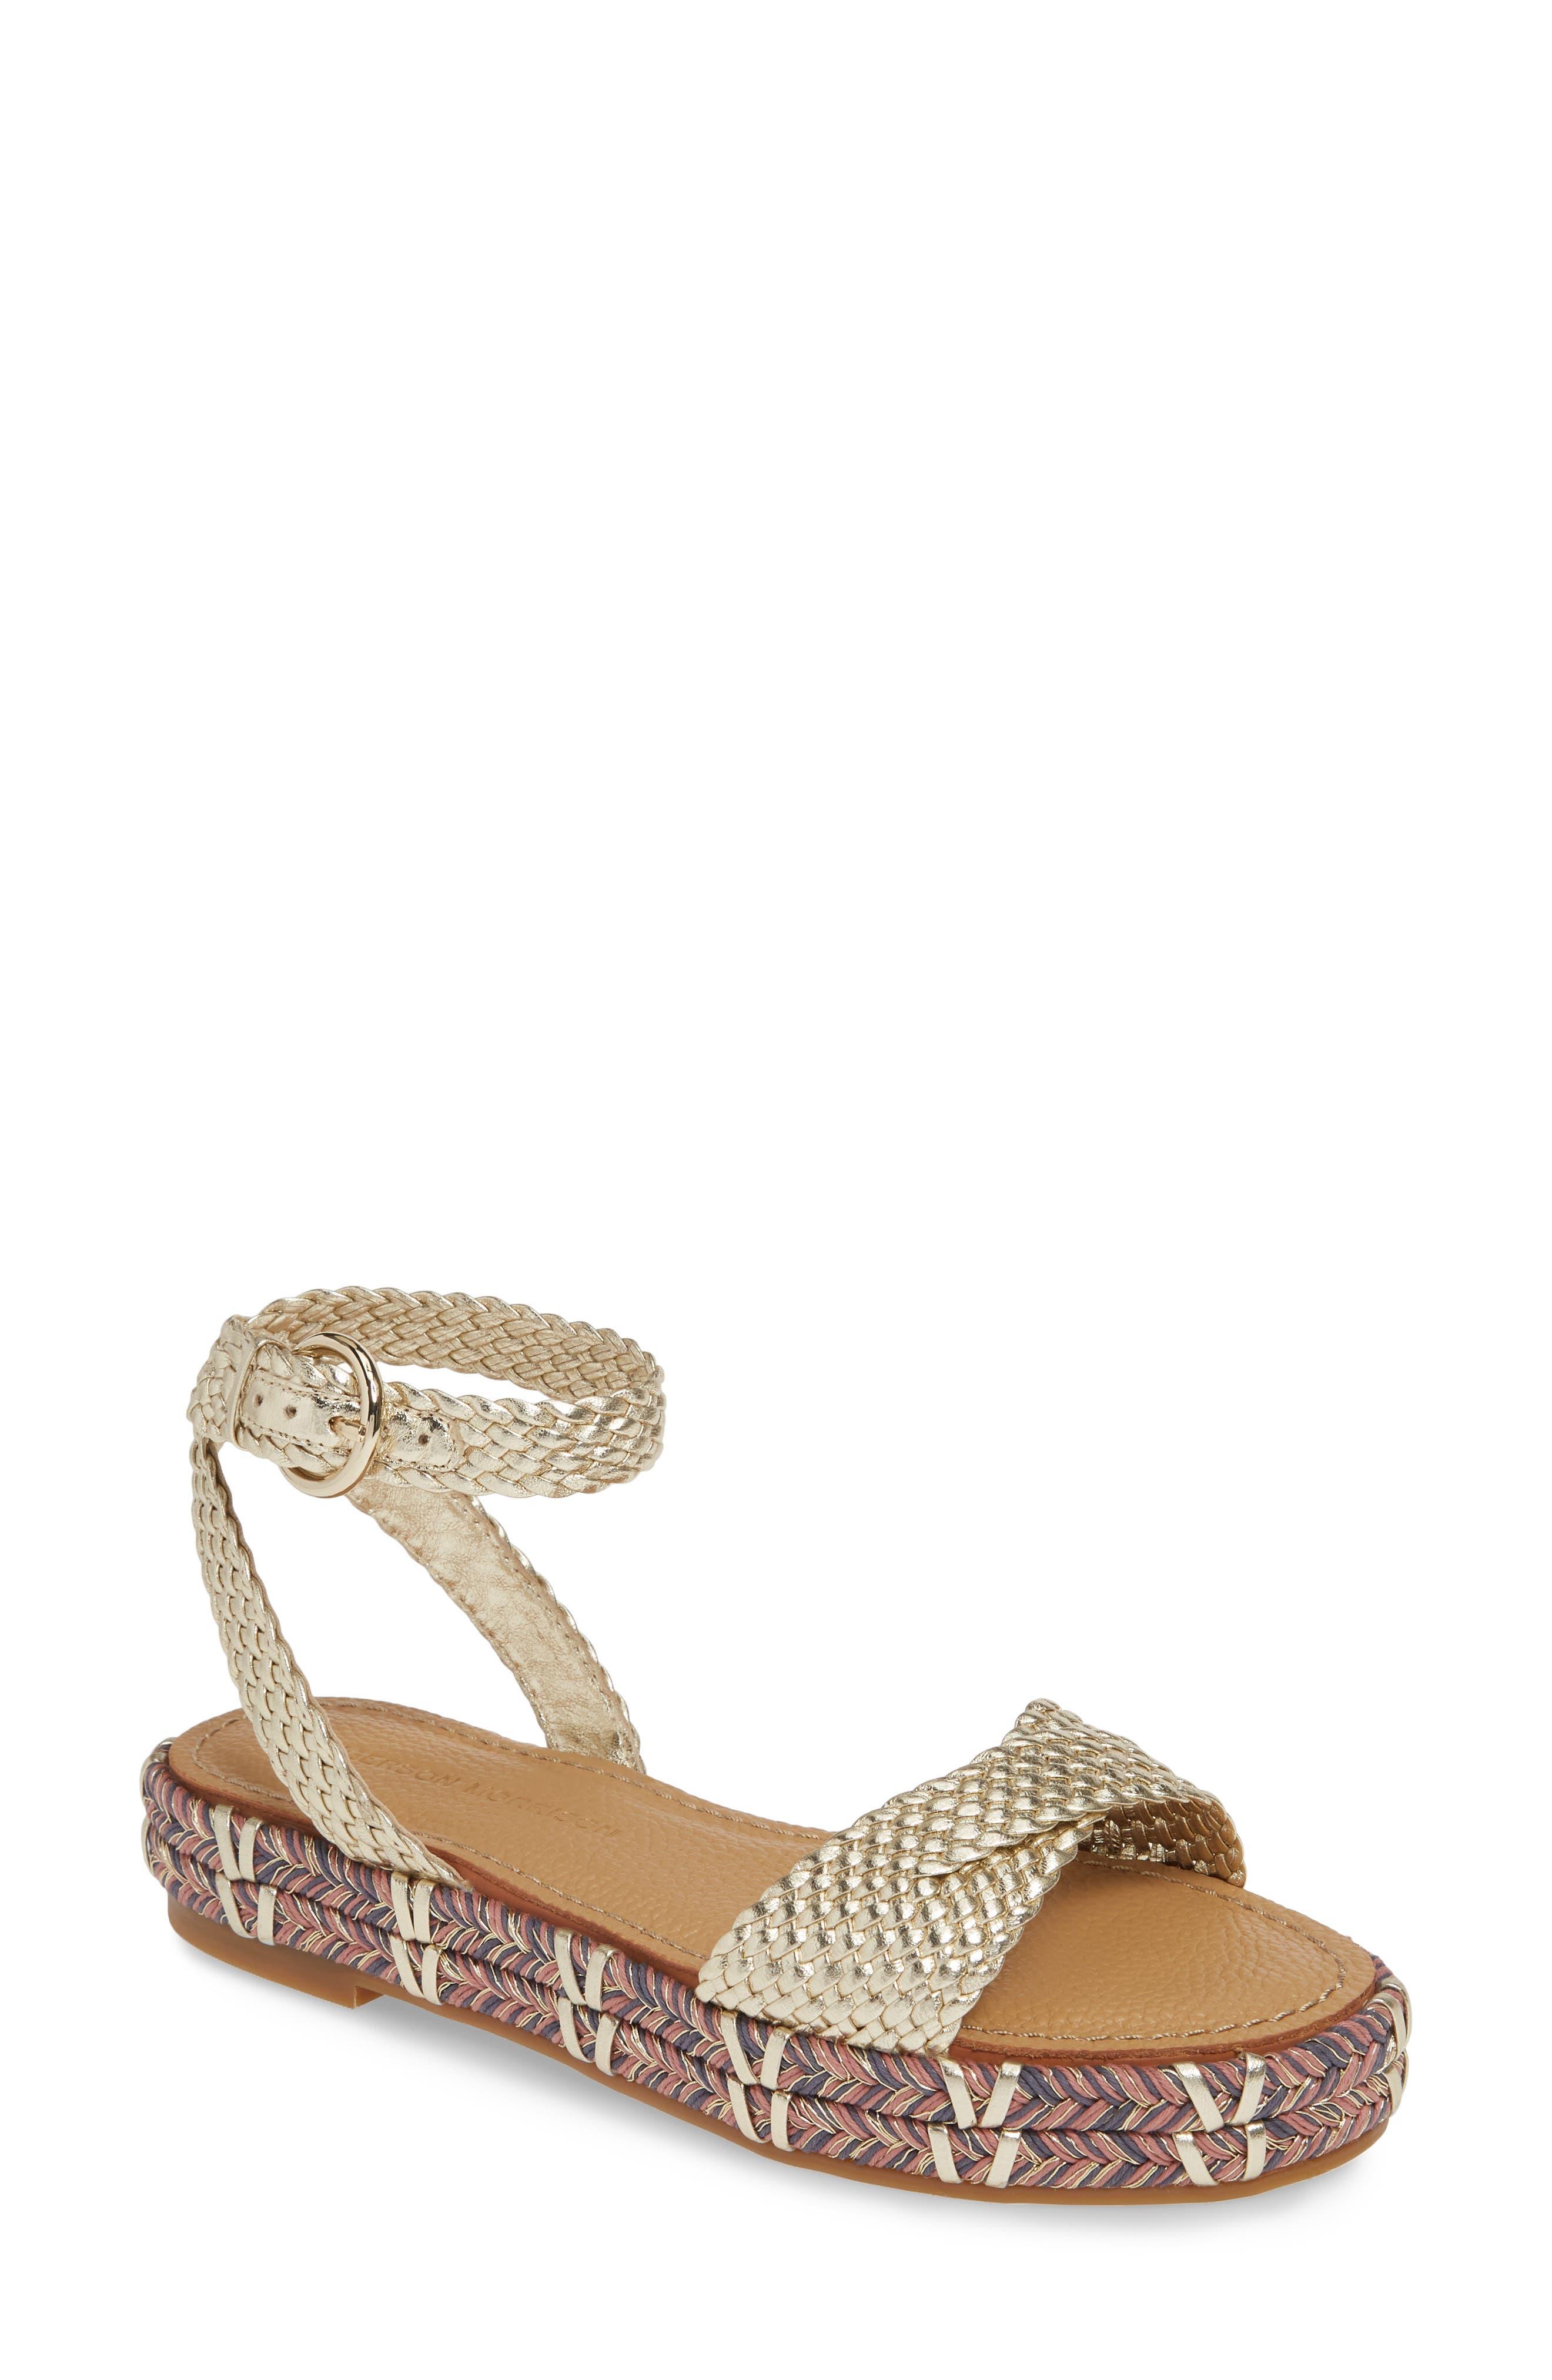 Sigerson Morrison Jaiyce Woven Platform Sandal, 7. - Metallic